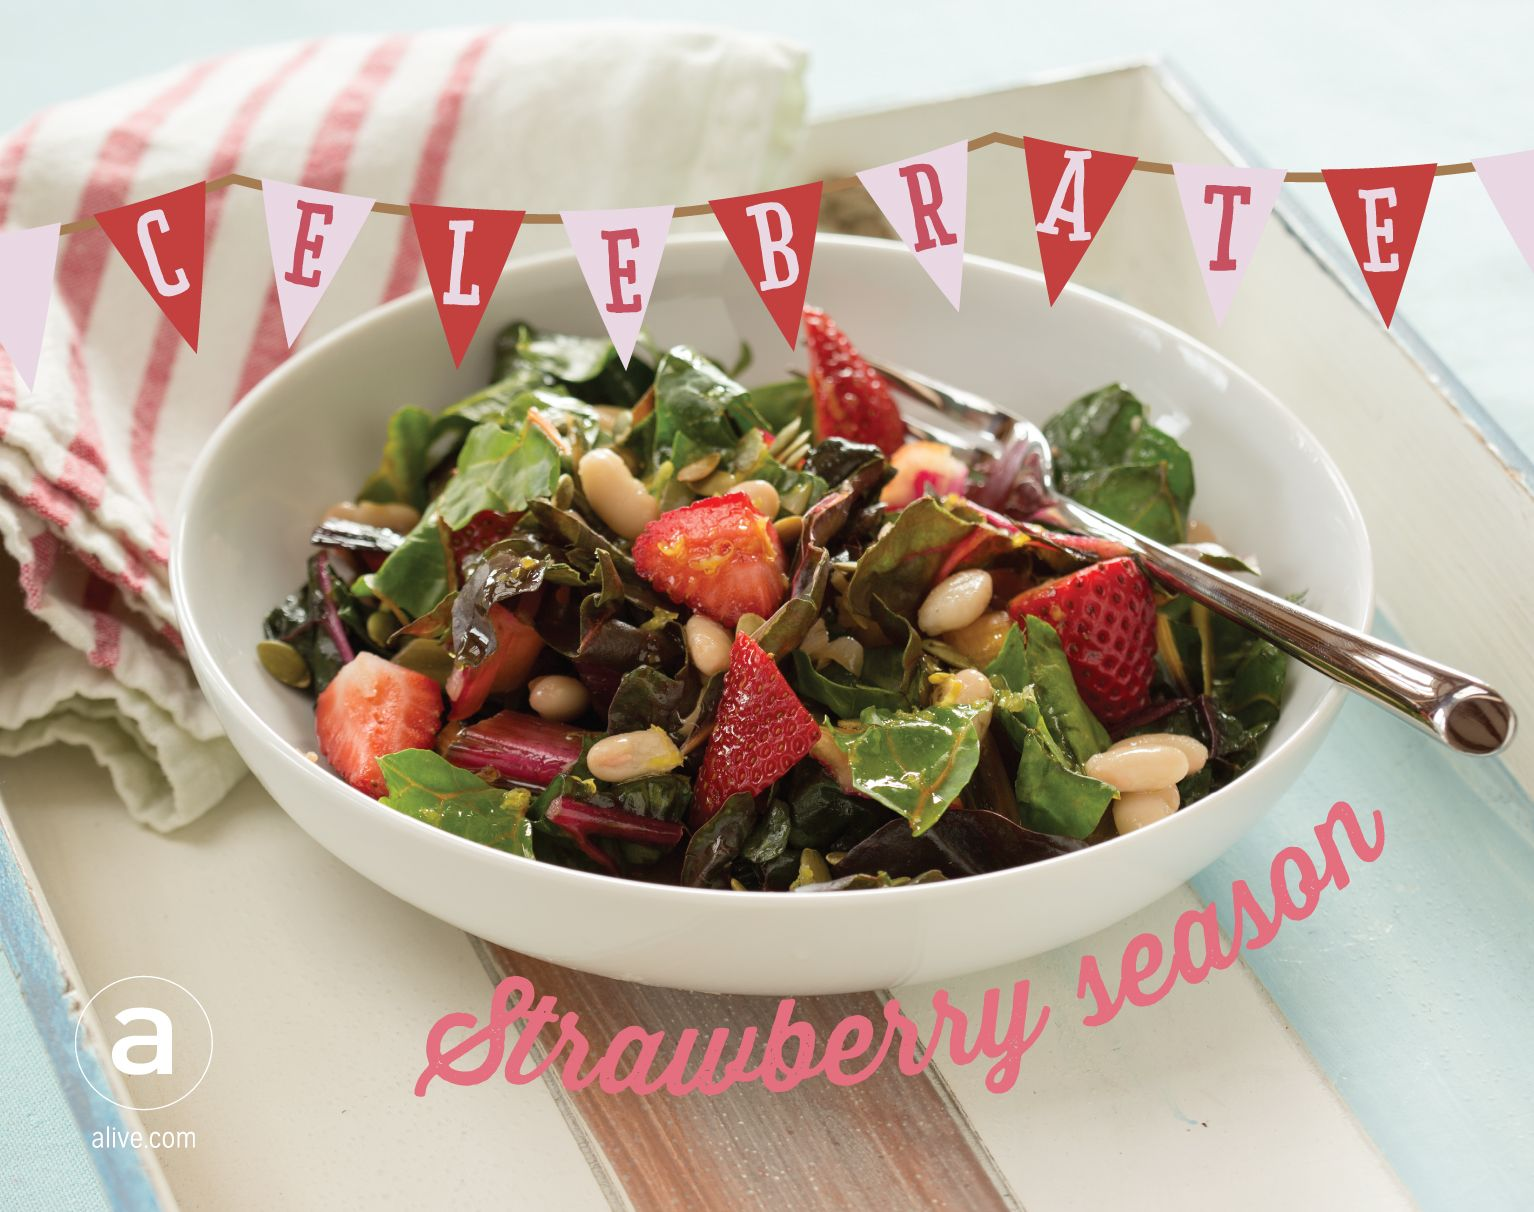 It won't last long, so make this Rainbow #chard and #strawberry #salad ASAP! #alivemagazine #eattherainbow #healthyrecipe #cleaneating #summer #strawberryseason